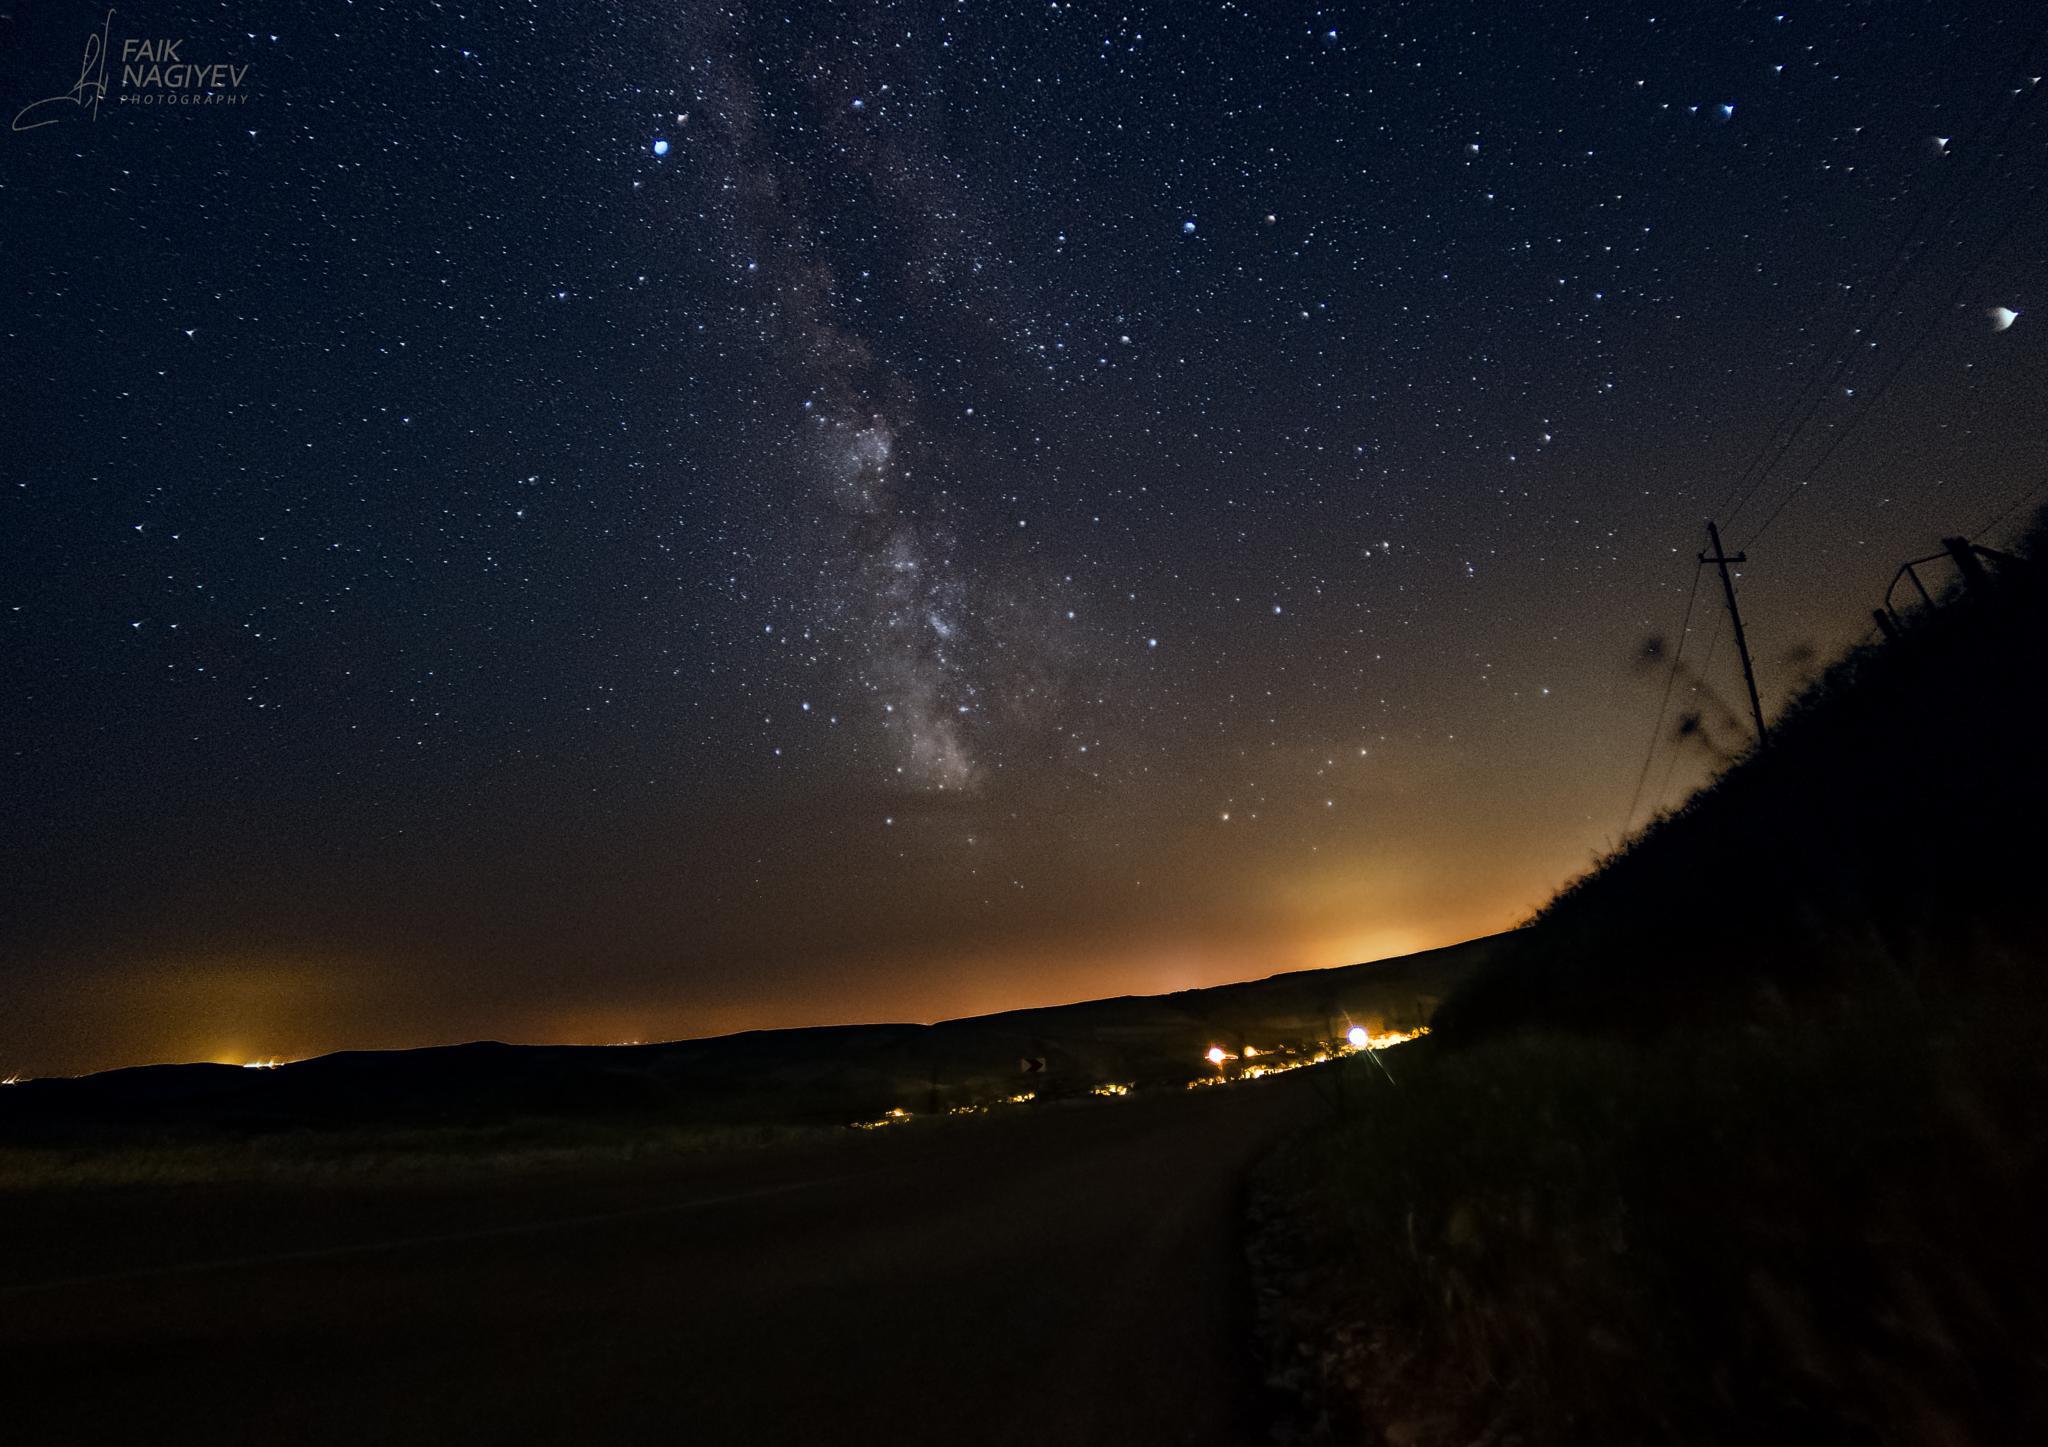 Calmness under the Milky Way by Faik Nagiyev